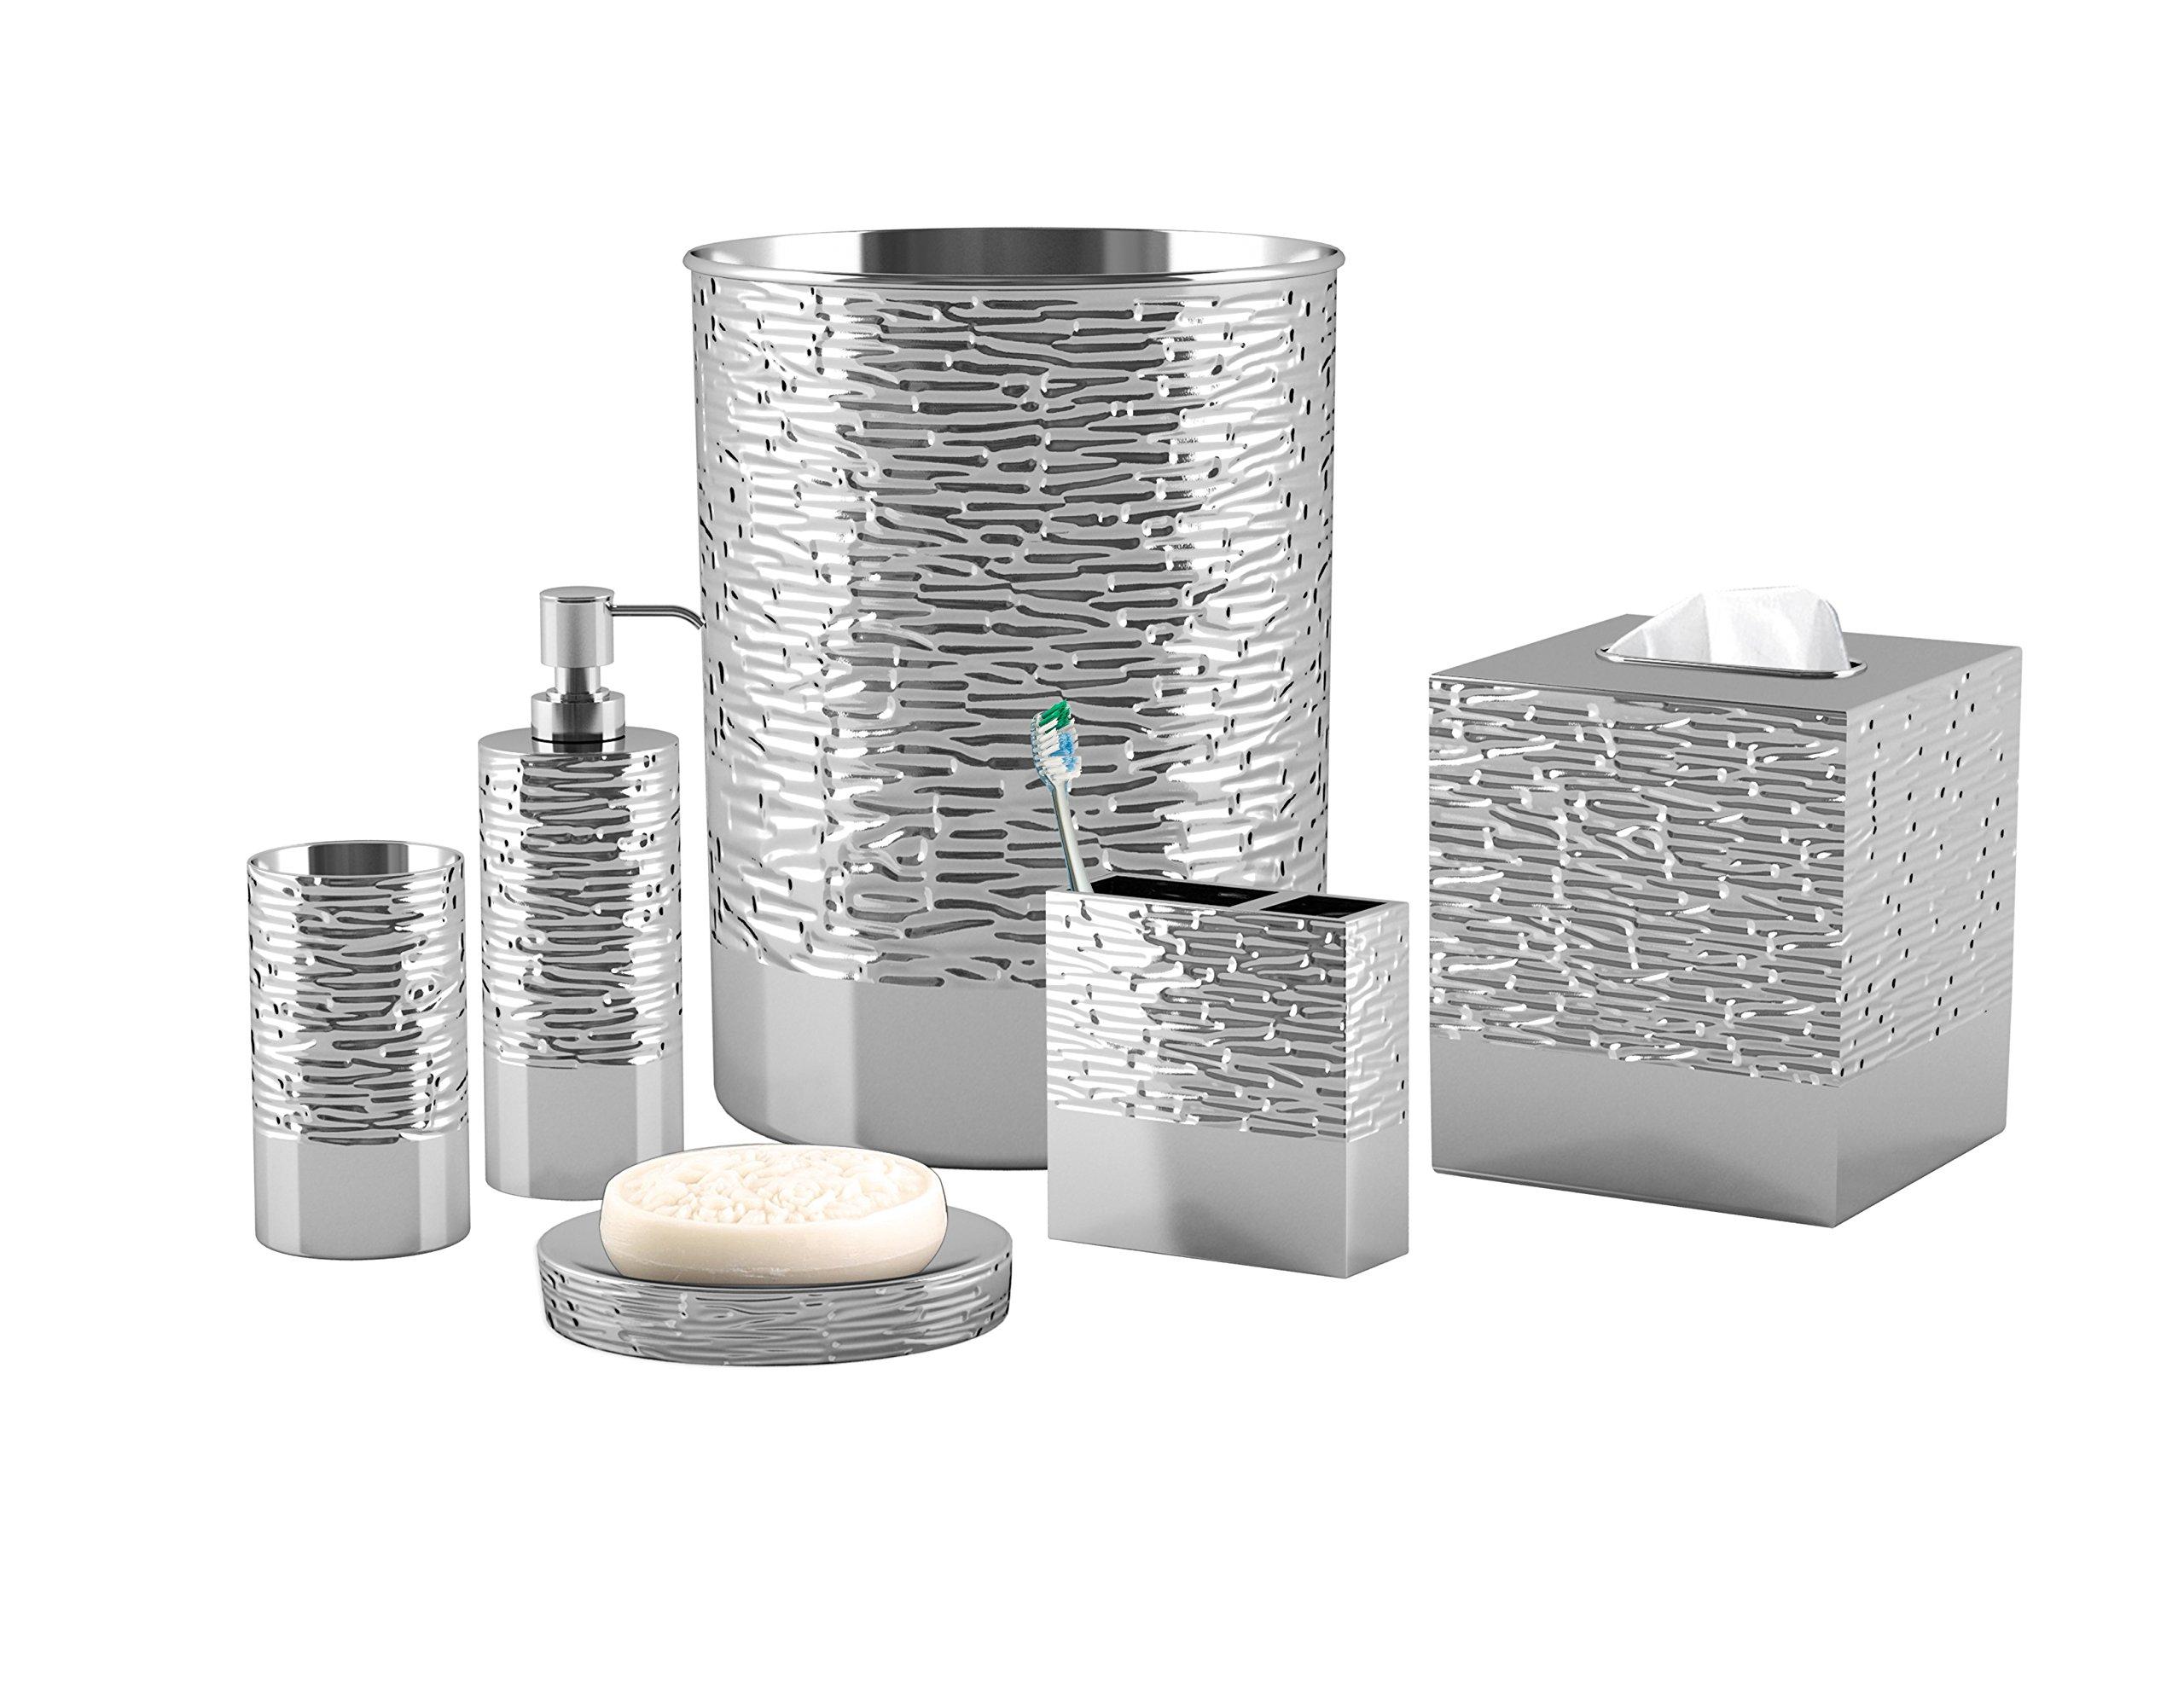 nu steel 7-Piece Metropolitan Bathroom Set